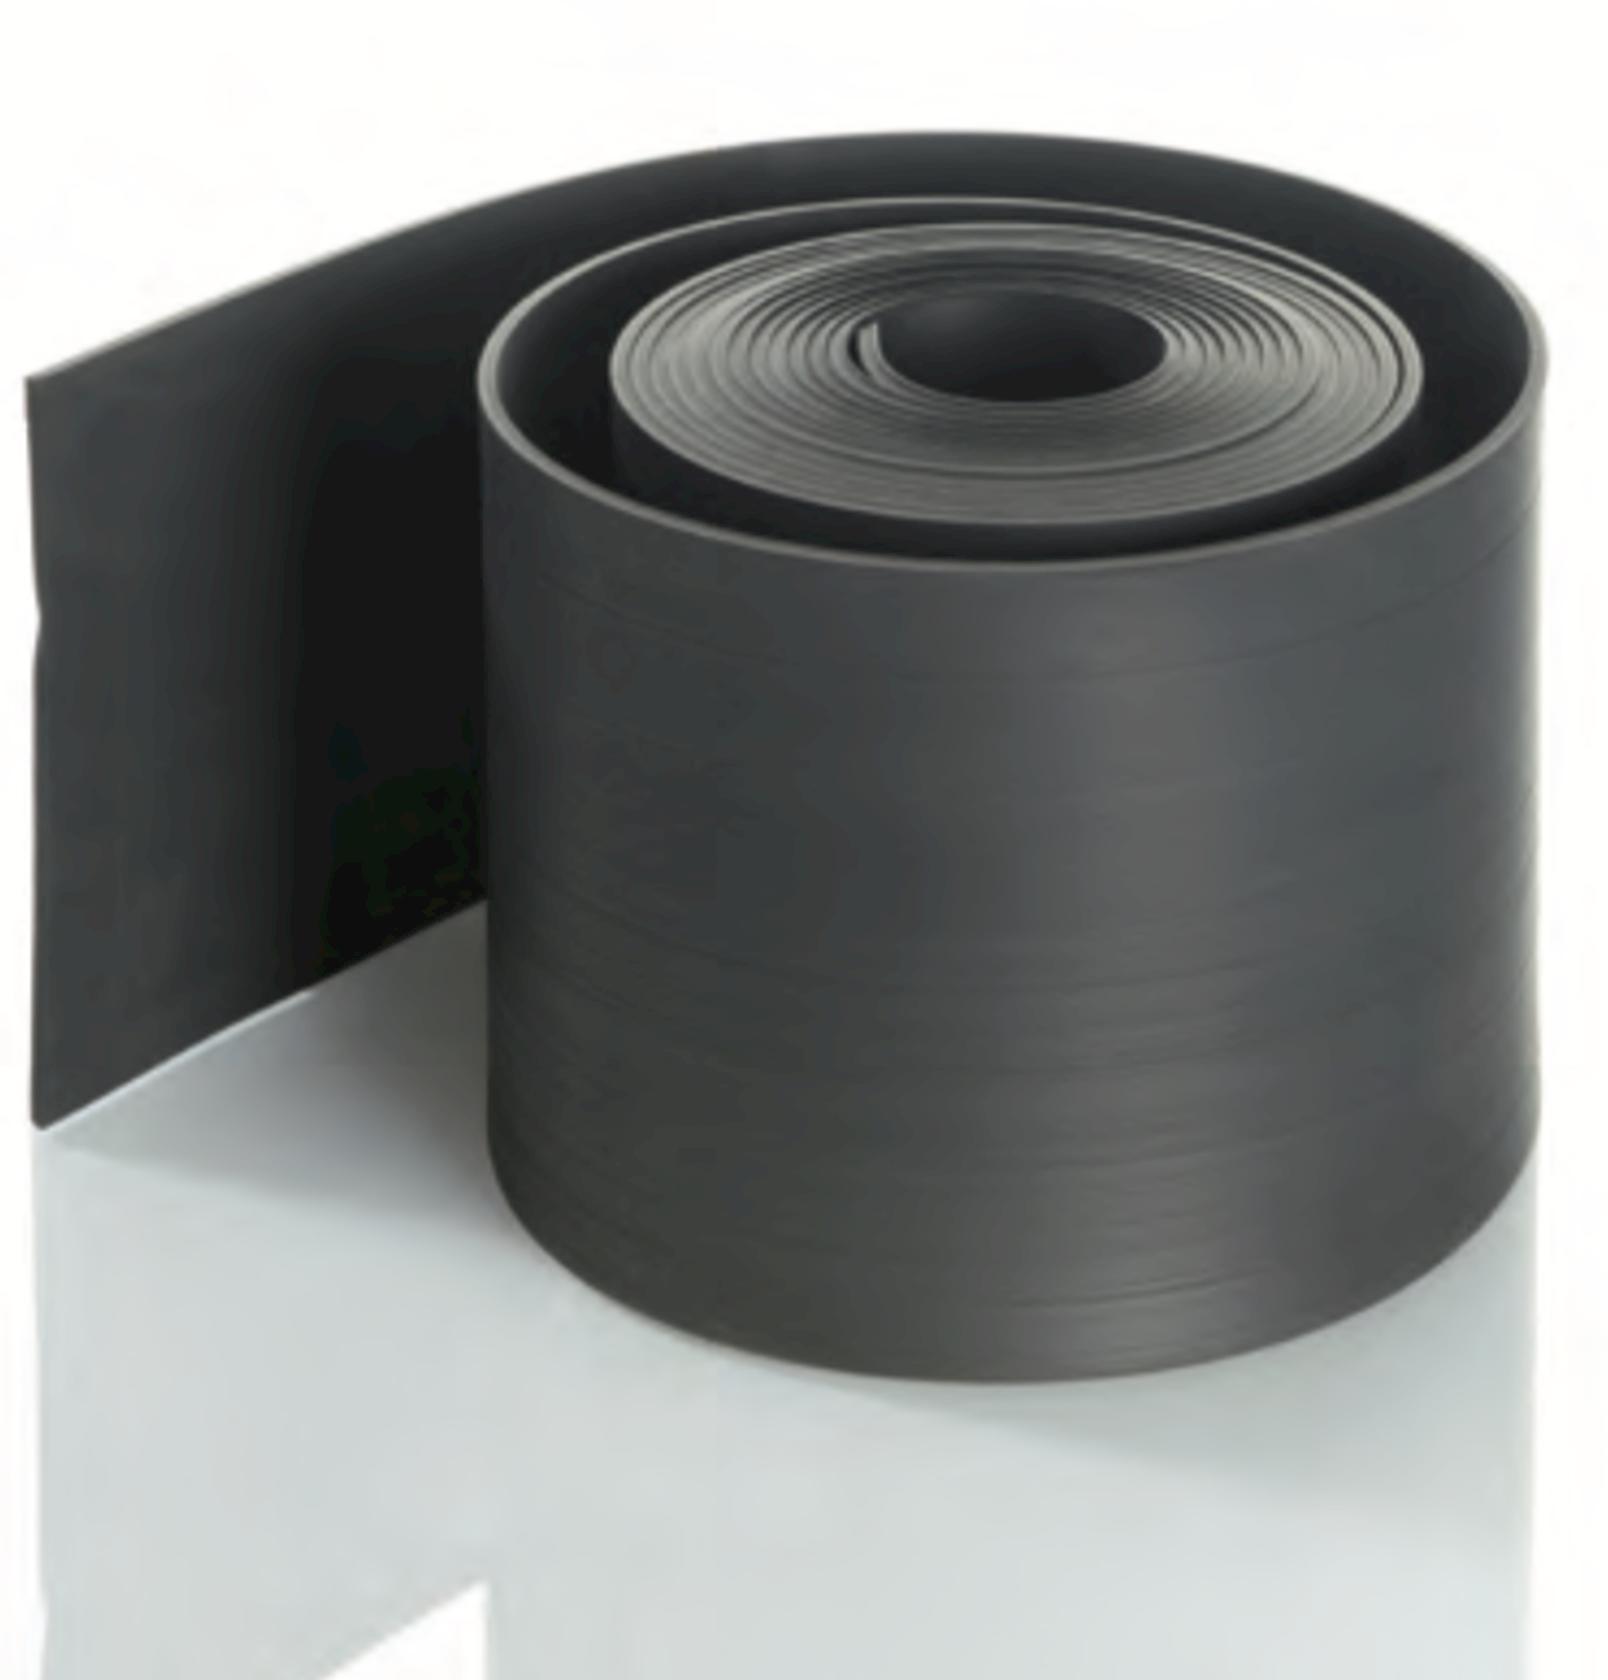 Ecorub afboording H13cm - L5m